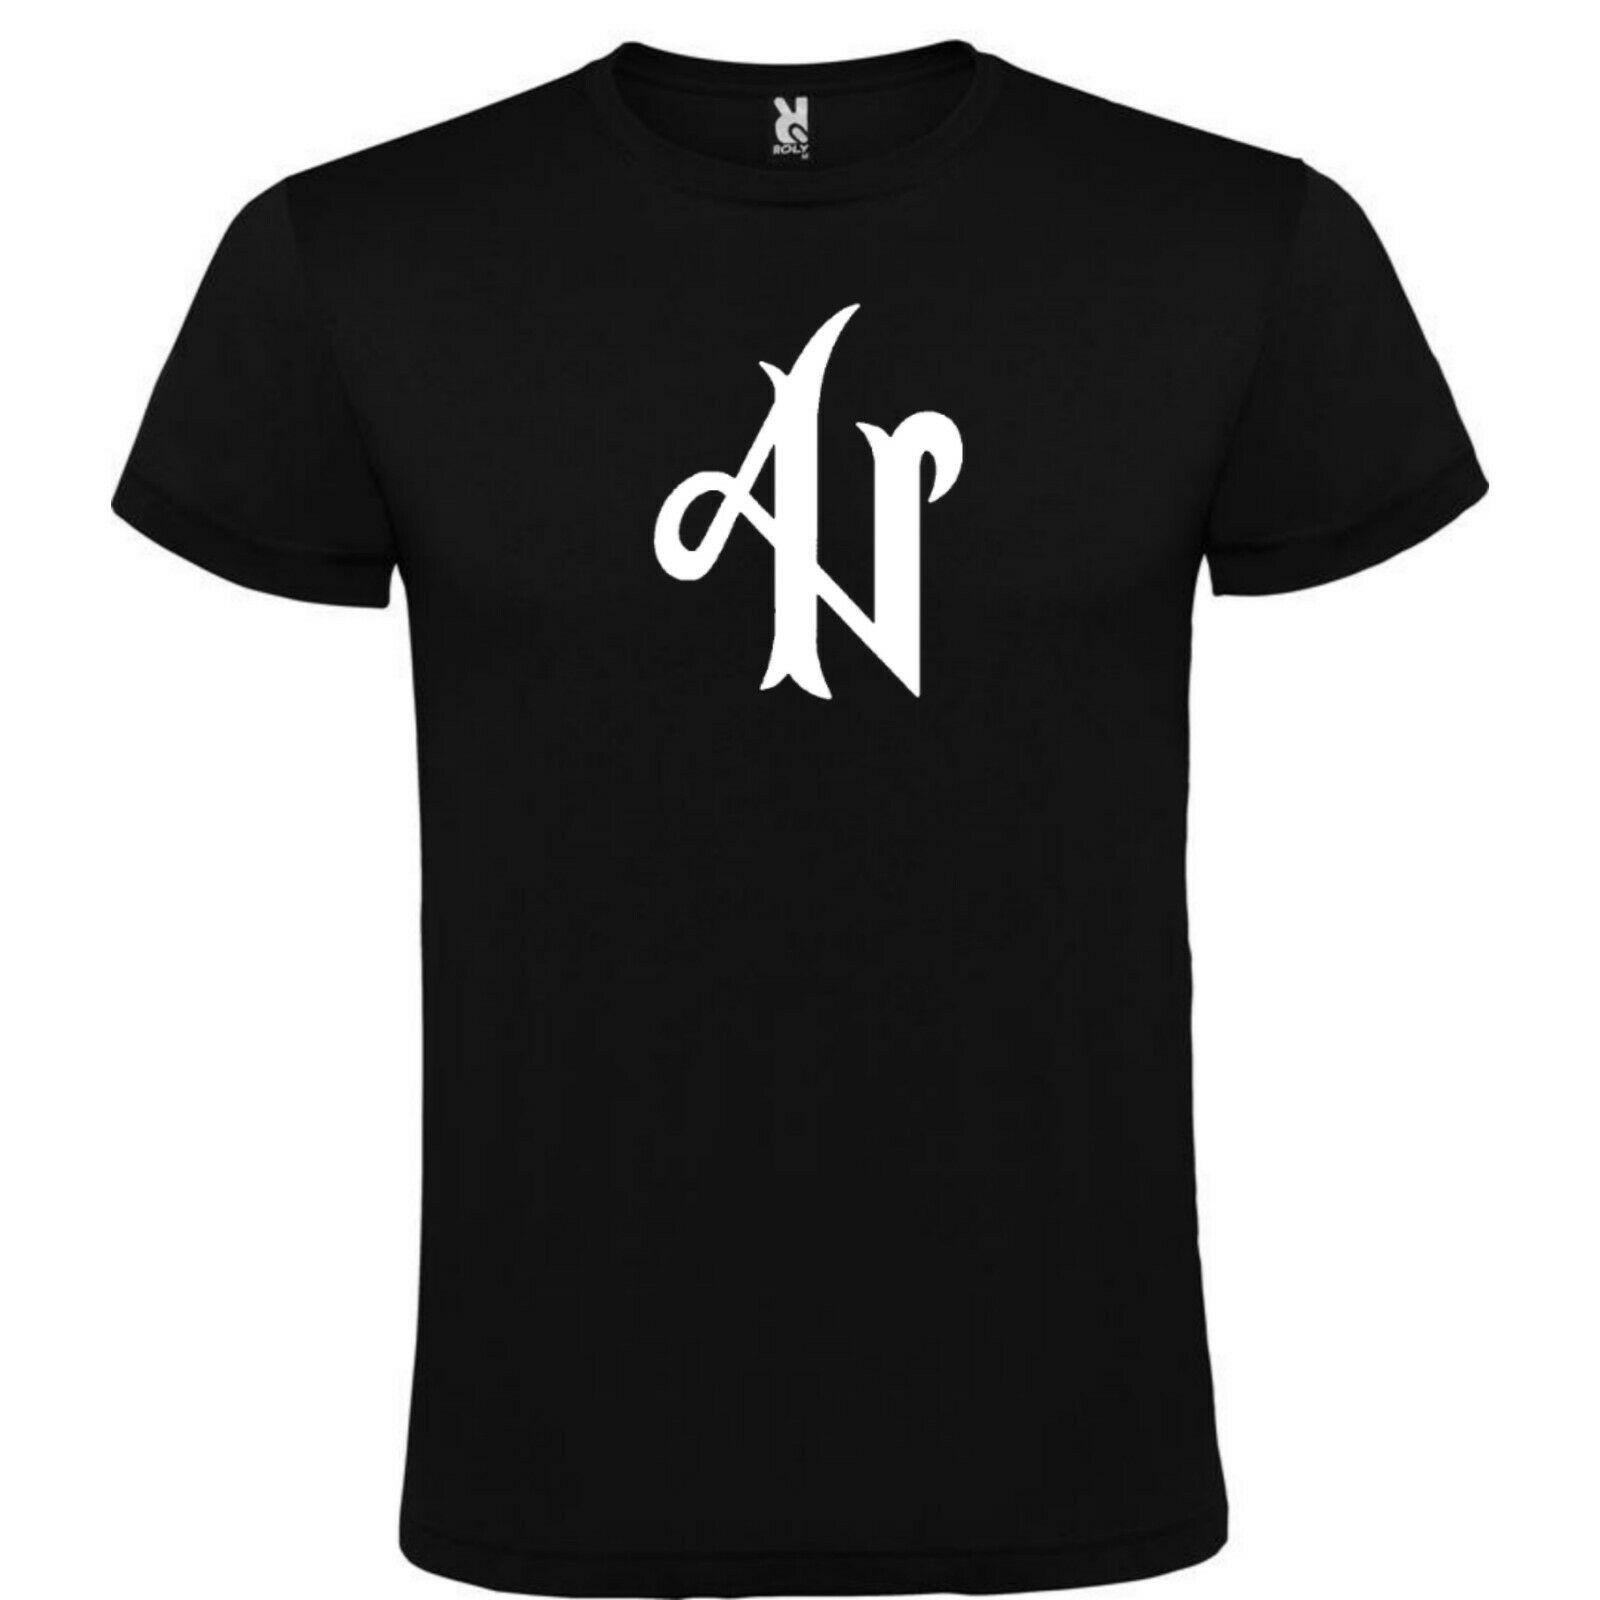 Camiseta Negra Adexe Y Nau Logo 100 Algodon Tallas S M L Xl Xxl Xxxl